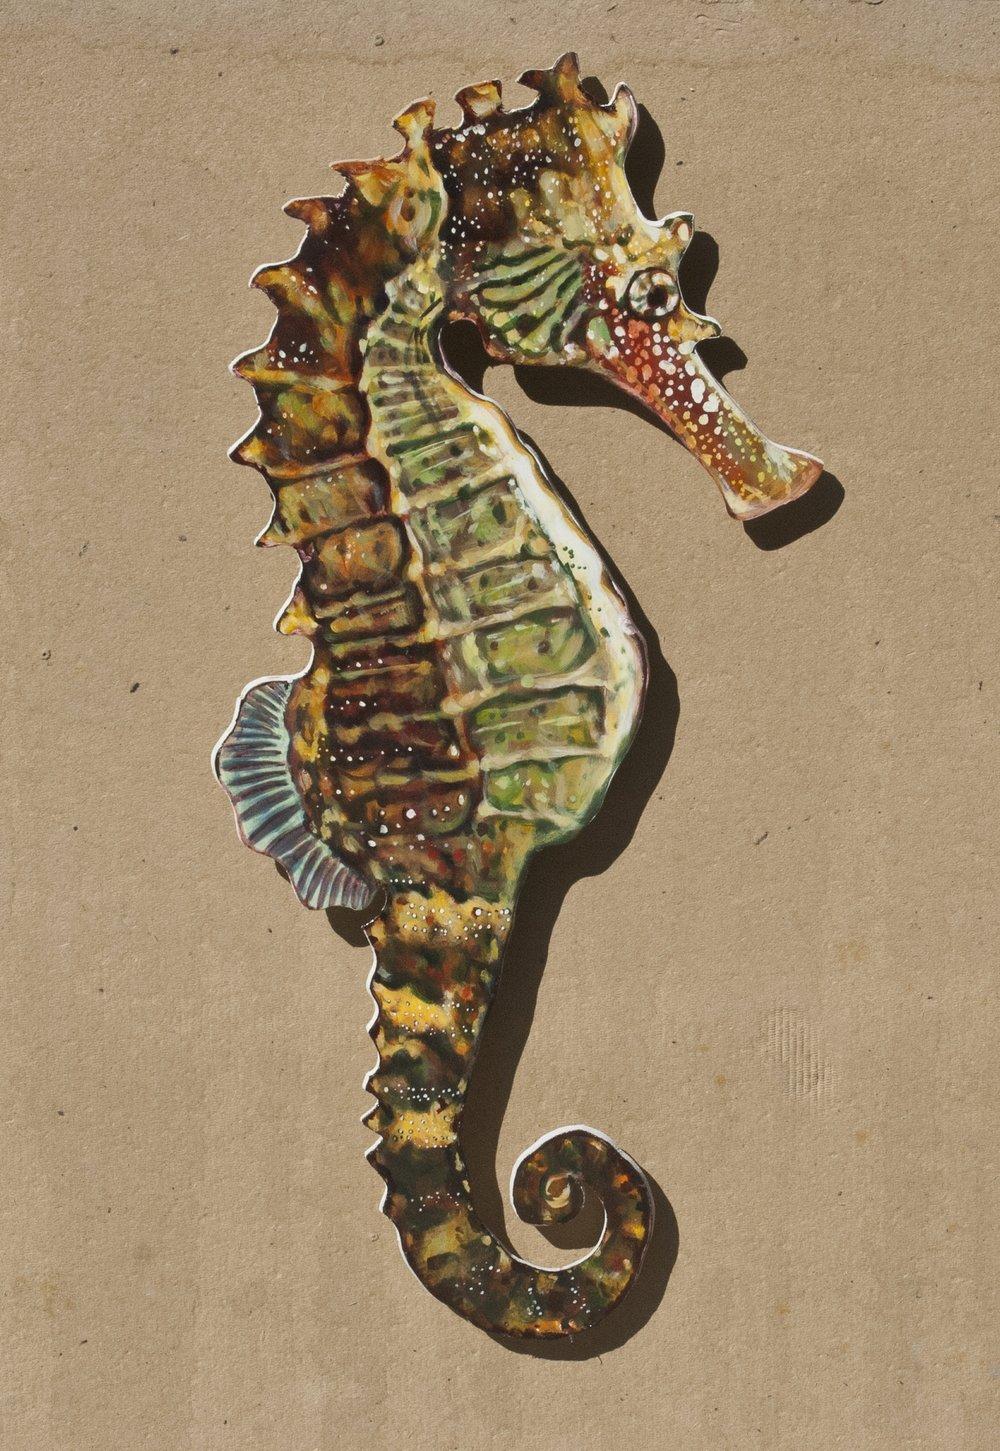 Seahorse, right